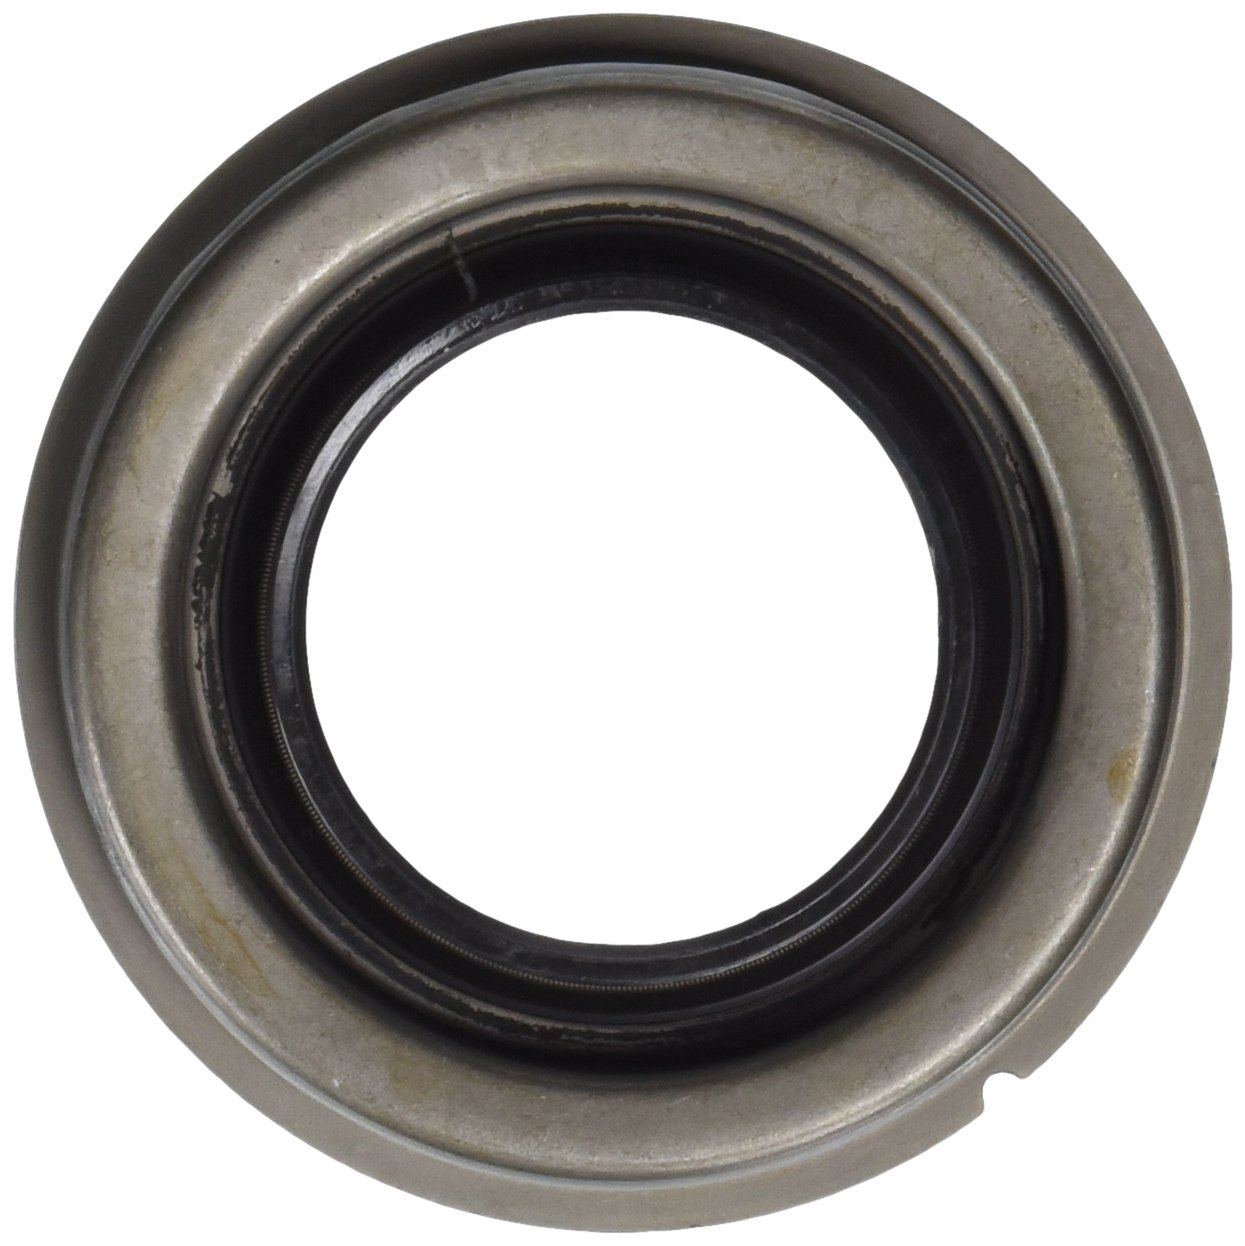 Genuine GM 88982399 Differential Drive Pinion Gear Seal